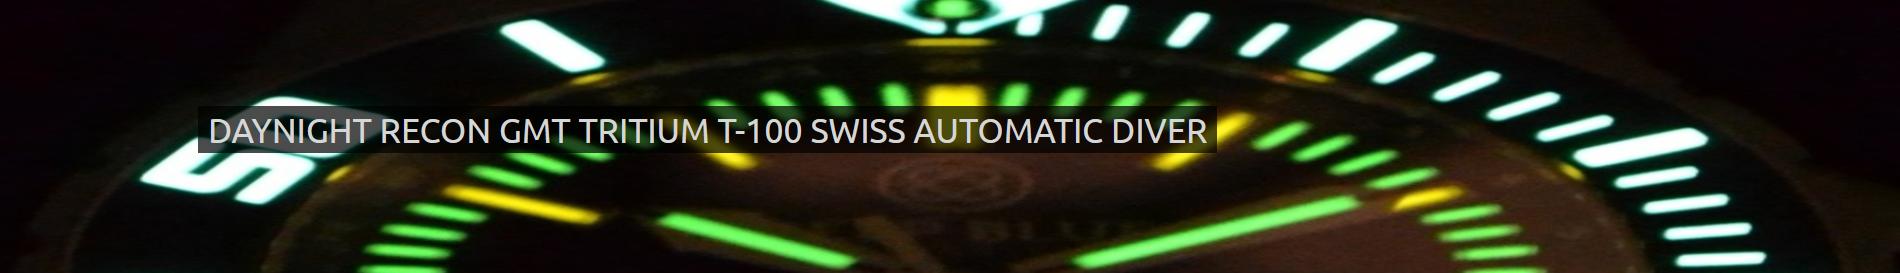 DAYNIGHT-RECON-GMT-TRITIUM-T-100-SWISS-AUTOMATIC-DIVER